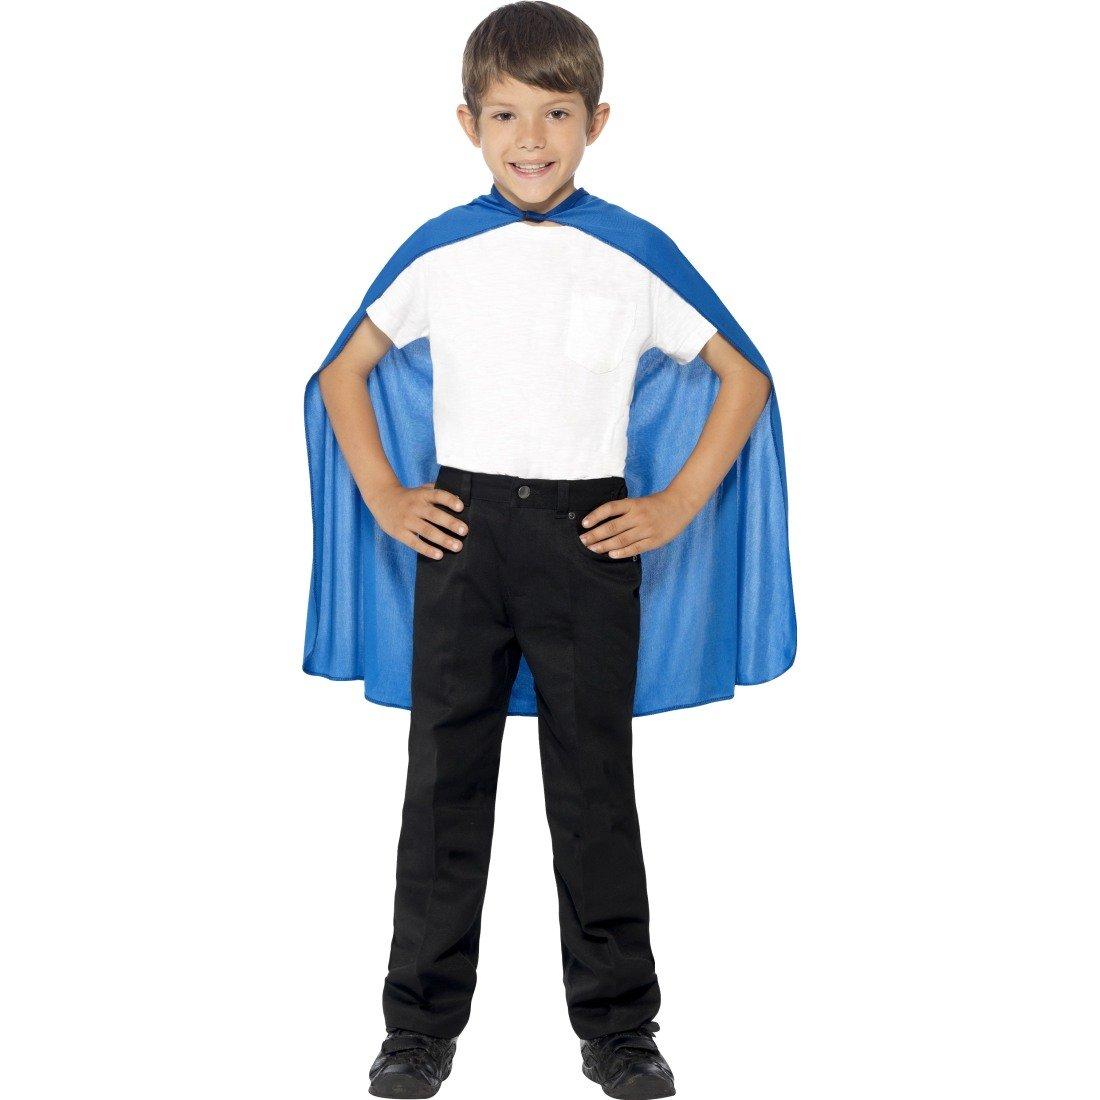 Amakando Superheldenumhang - Blau - Superman Umhang Helden Kostü m Jungen Kinder Superheld Kostü m Superhero Cape Outfit Blauer Kinderumhang